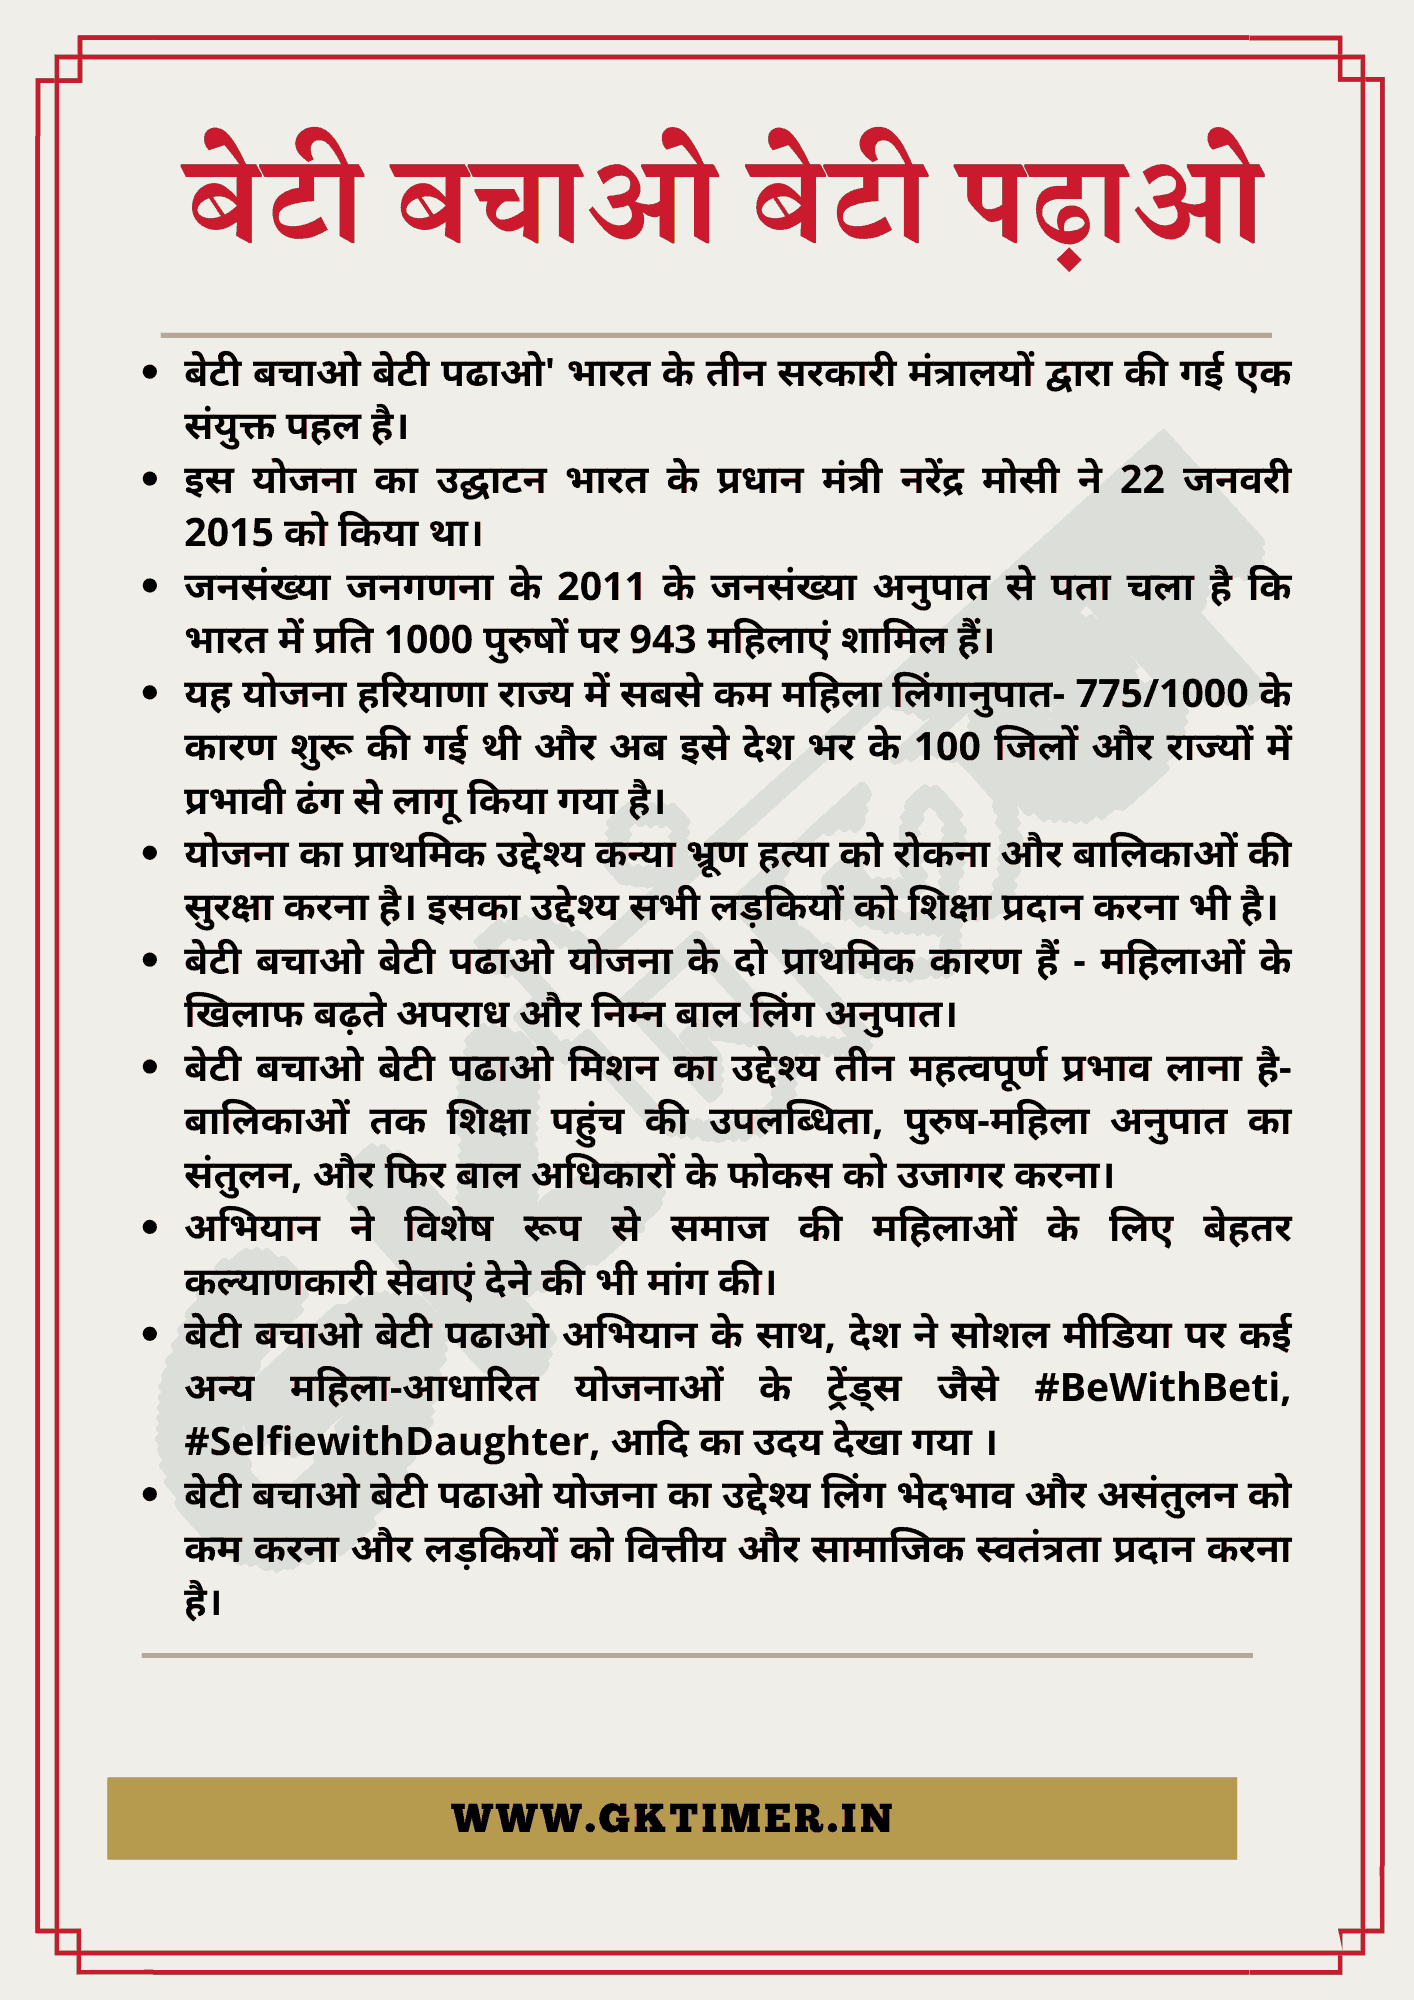 बेटी बचाओ बेटी पढाओ पर निबंध | Long and Short Essay on Beti Bachao Beti Padhao in Hindi | 10 Lines on Beti Bachao Beti Padhao in Hindi